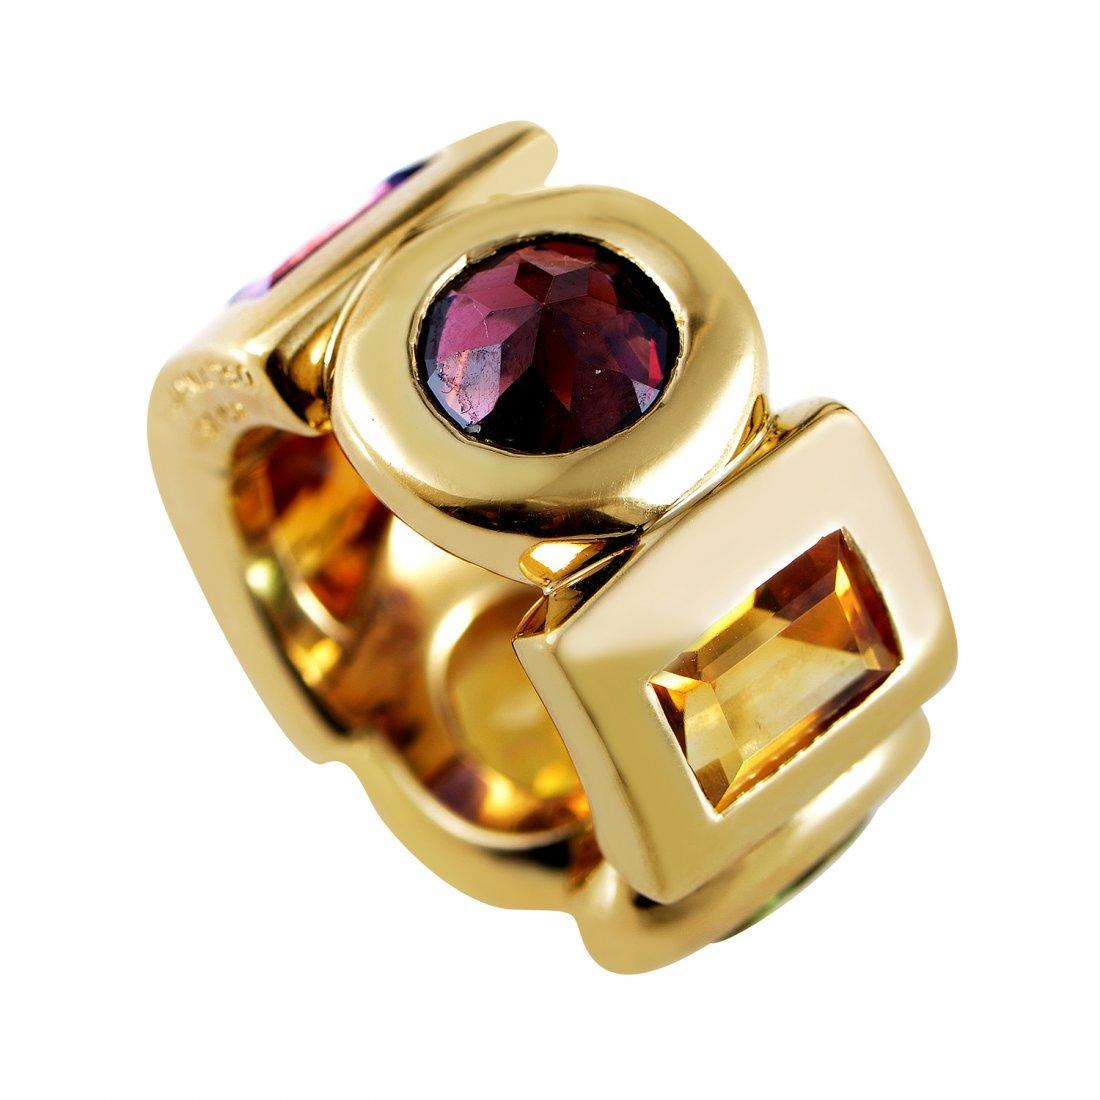 Chanel 18K Yellow Gold Large Multi-Stone Ring